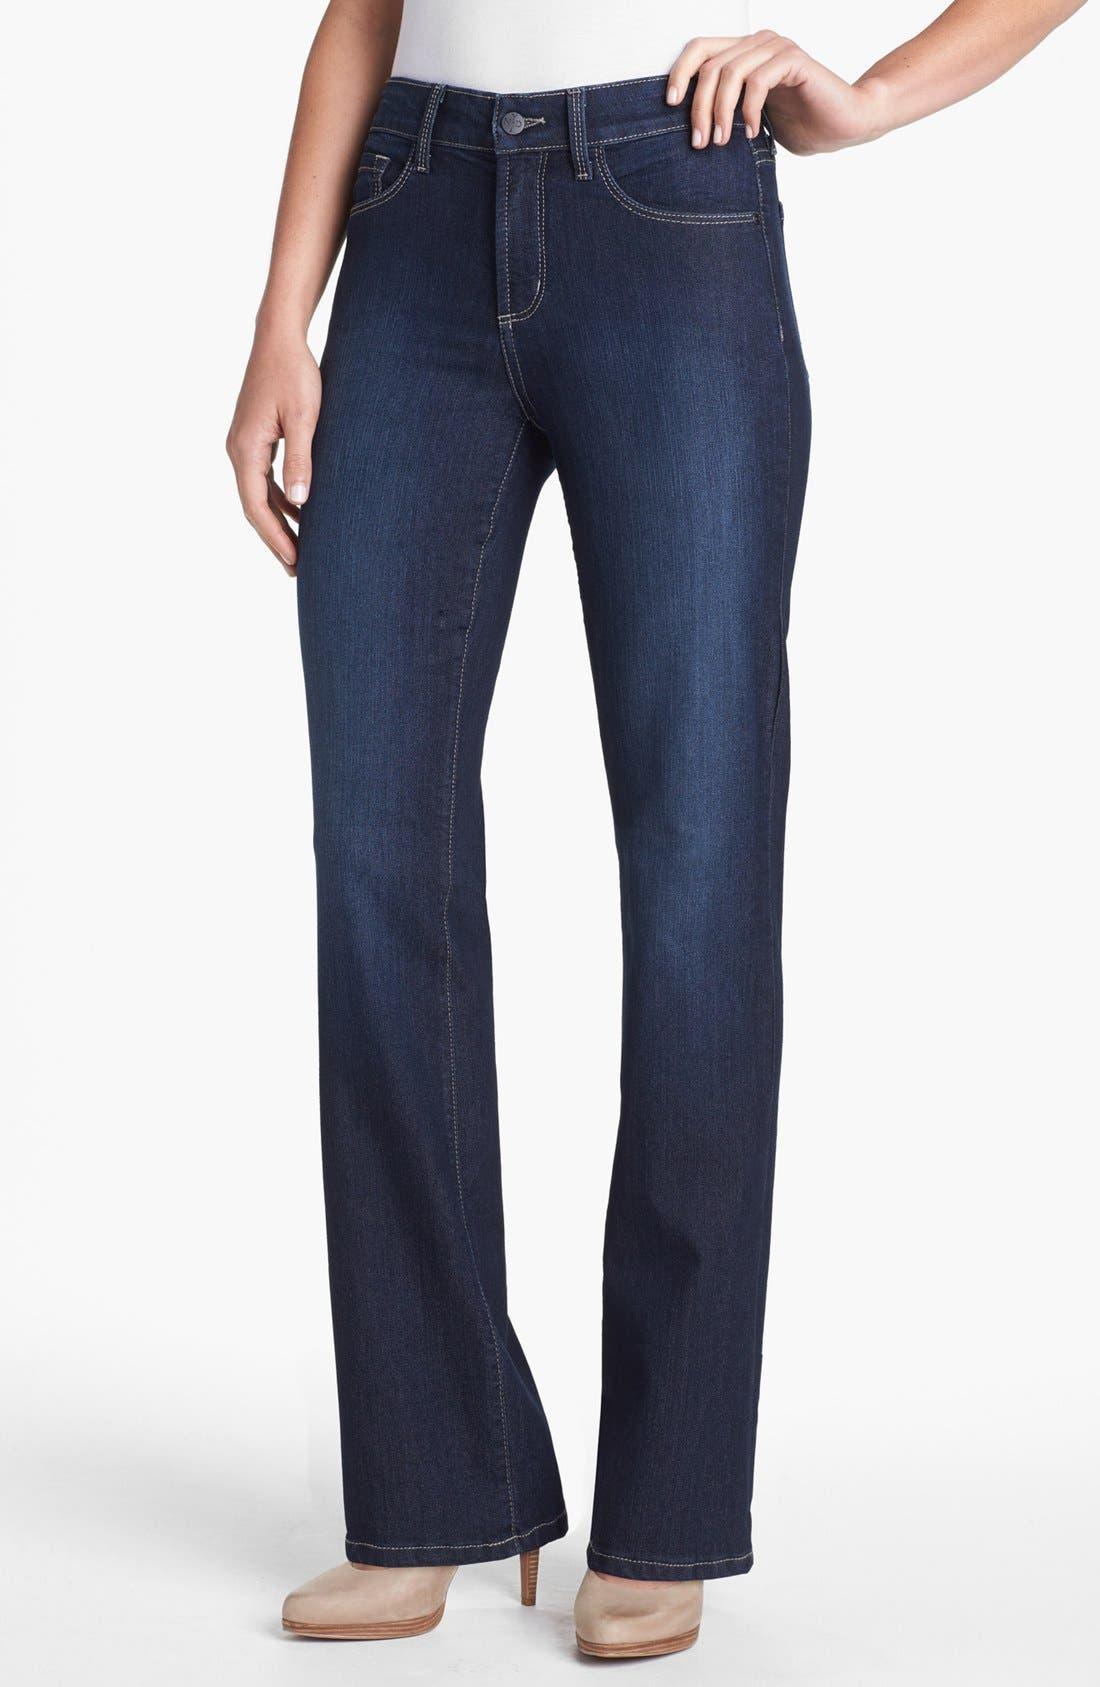 Alternate Image 1 Selected - NYDJ 'Barbara' Embellished Pocket Stretch Bootcut Jeans (Hollywood) (Regular & Petite)